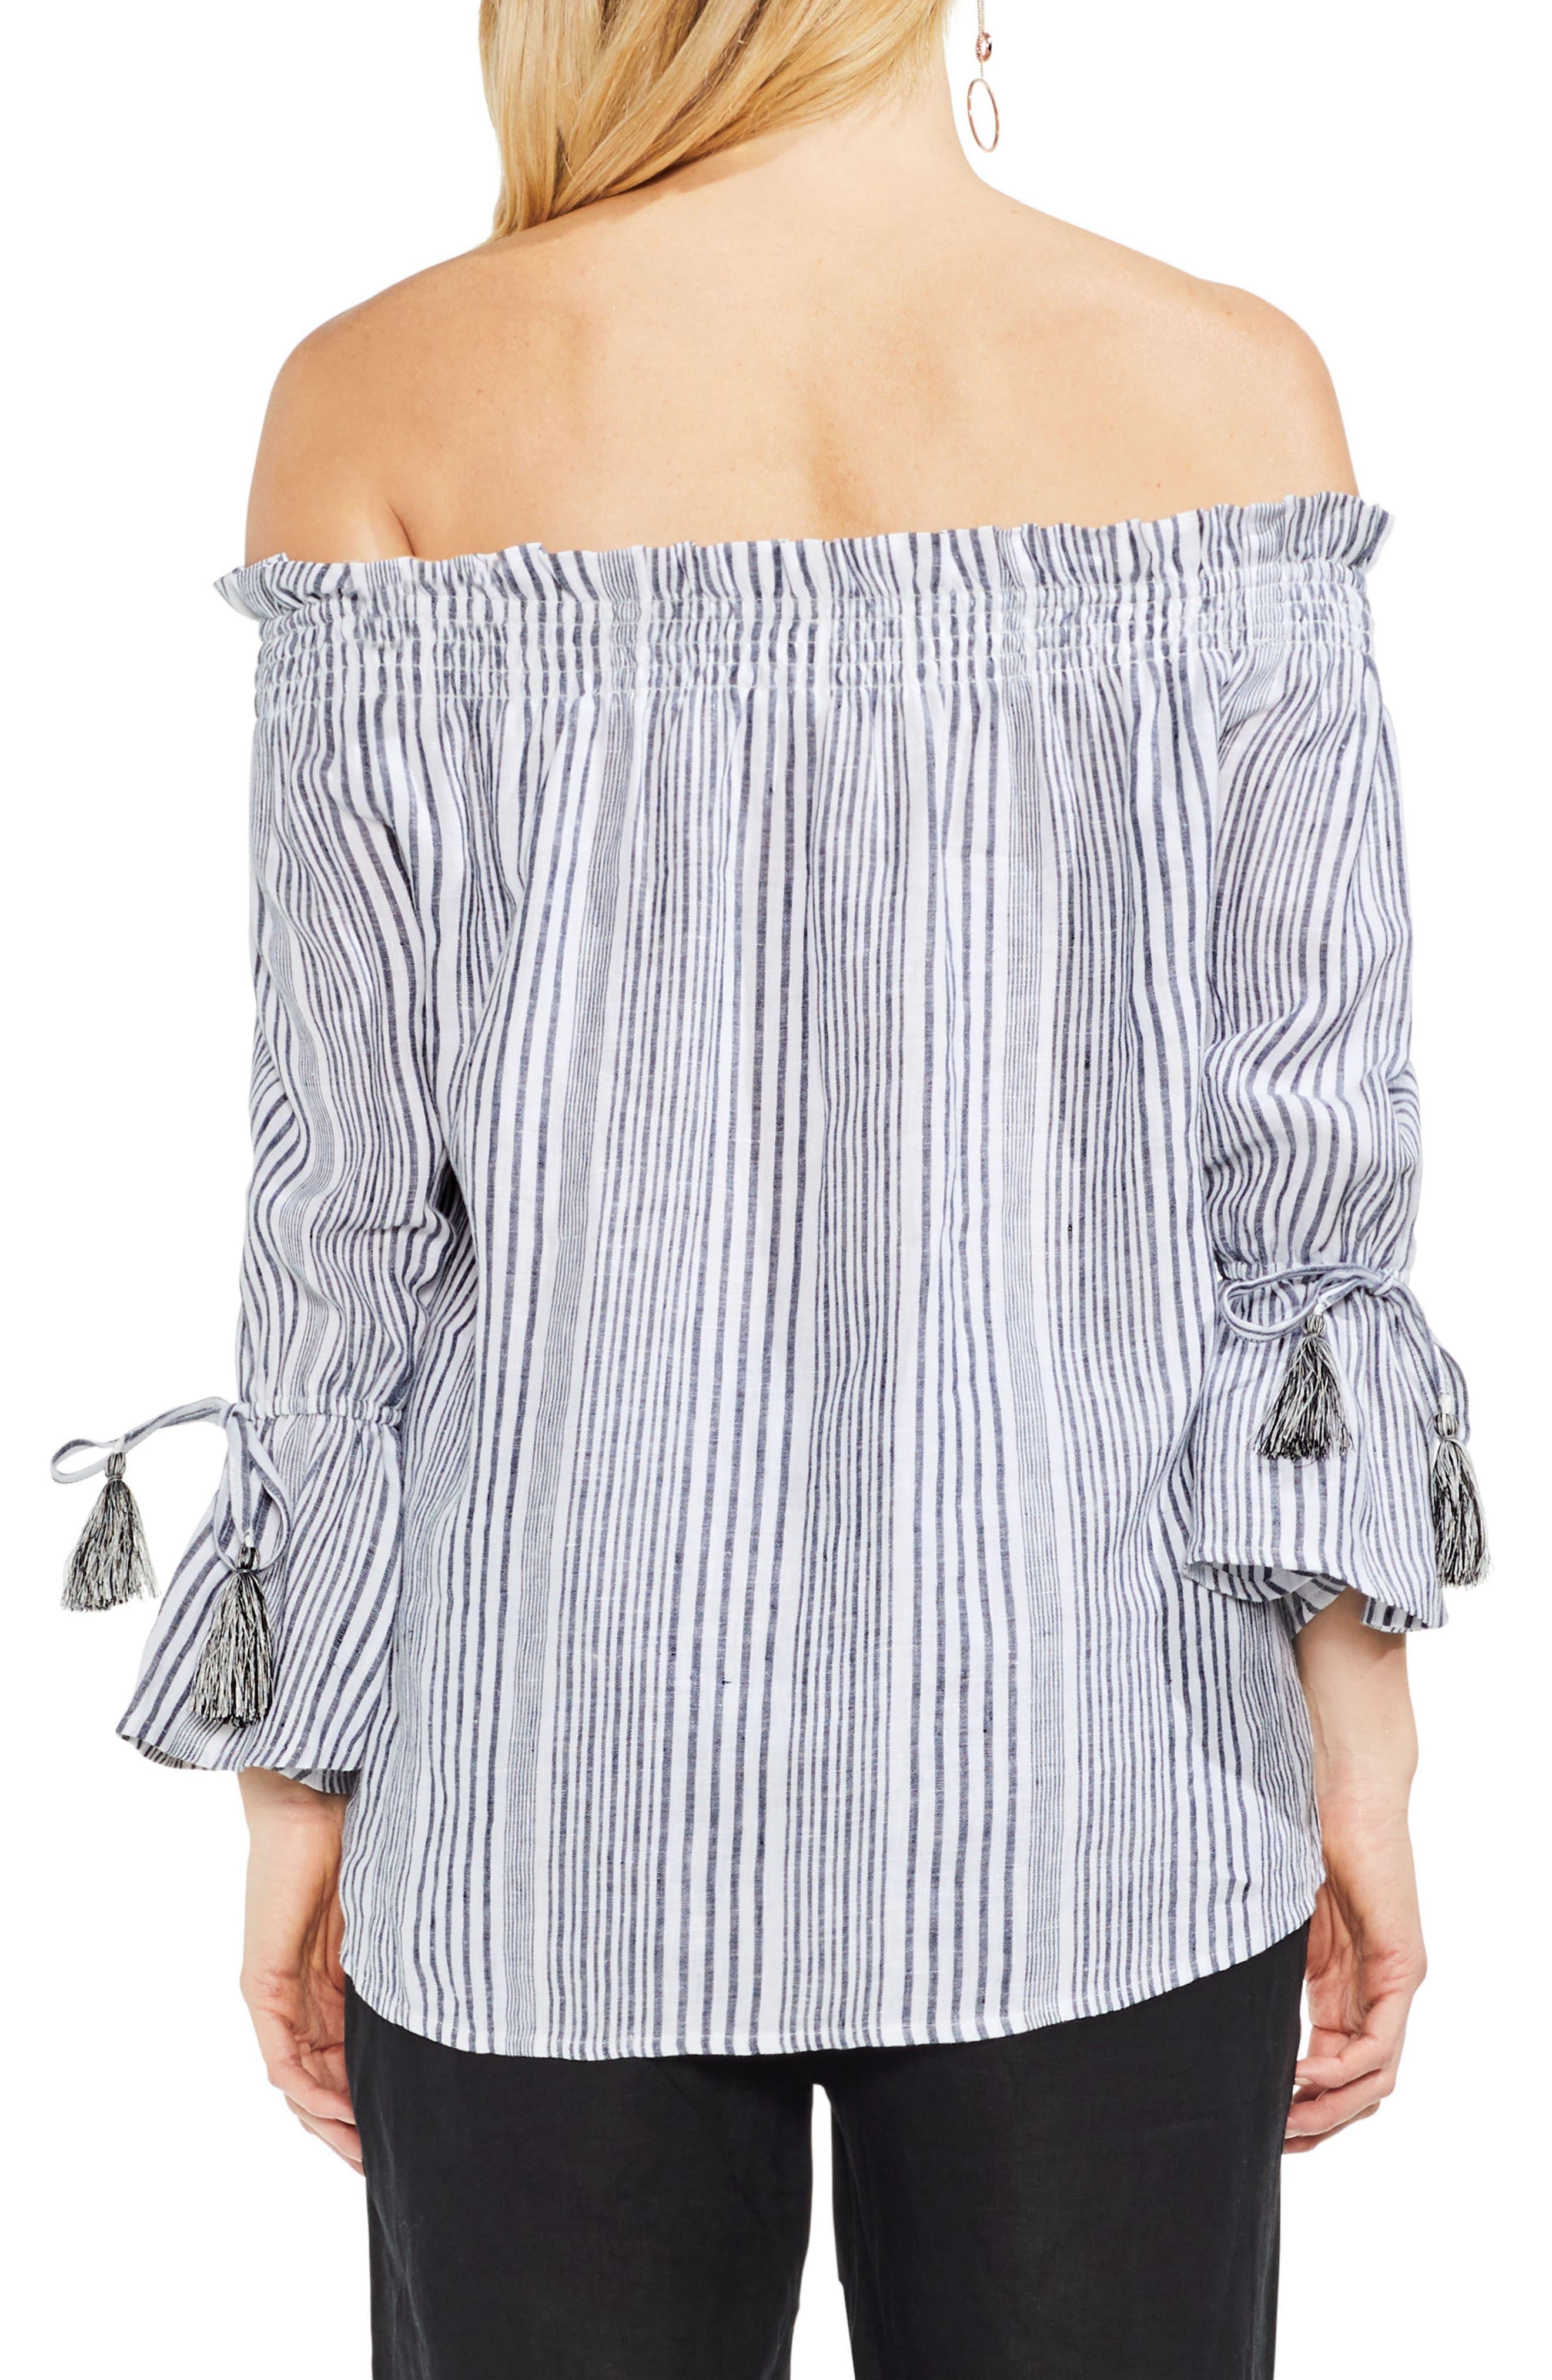 Linen Stripe Statement Sleeve Top,                             Alternate thumbnail 2, color,                             Rich Black